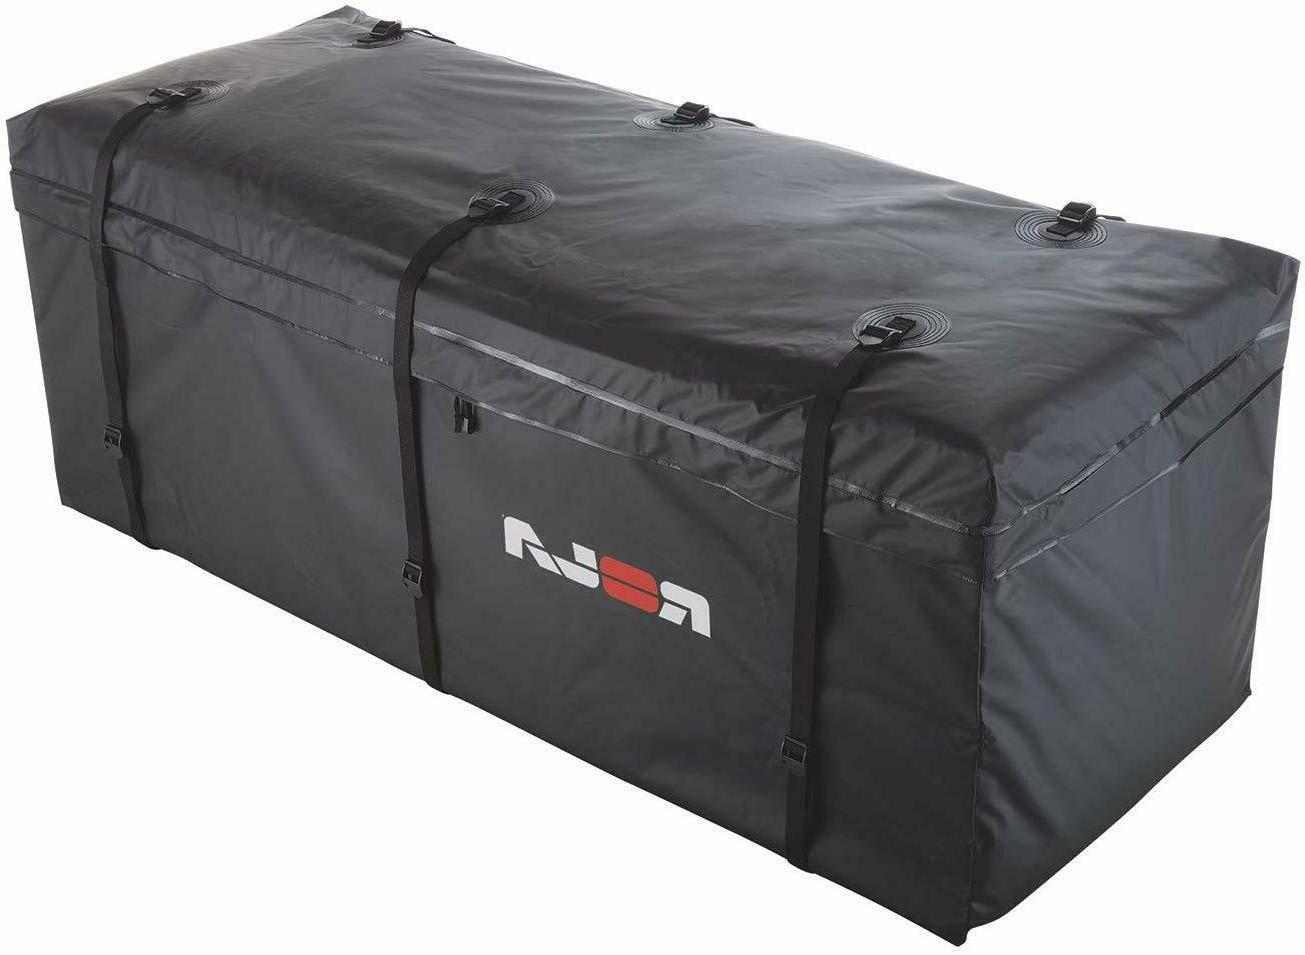 59119 rainproof cargo carrier bag